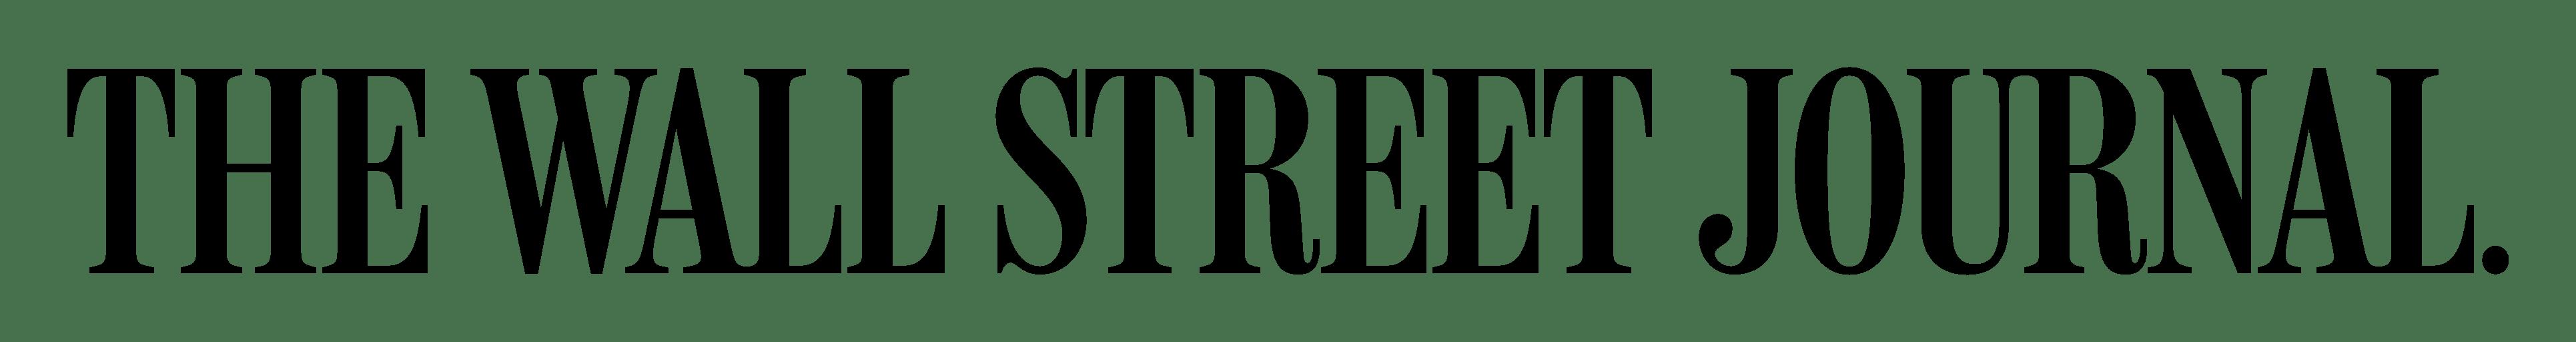 The Wall Street Journal Logo transparent PNG StickPNG